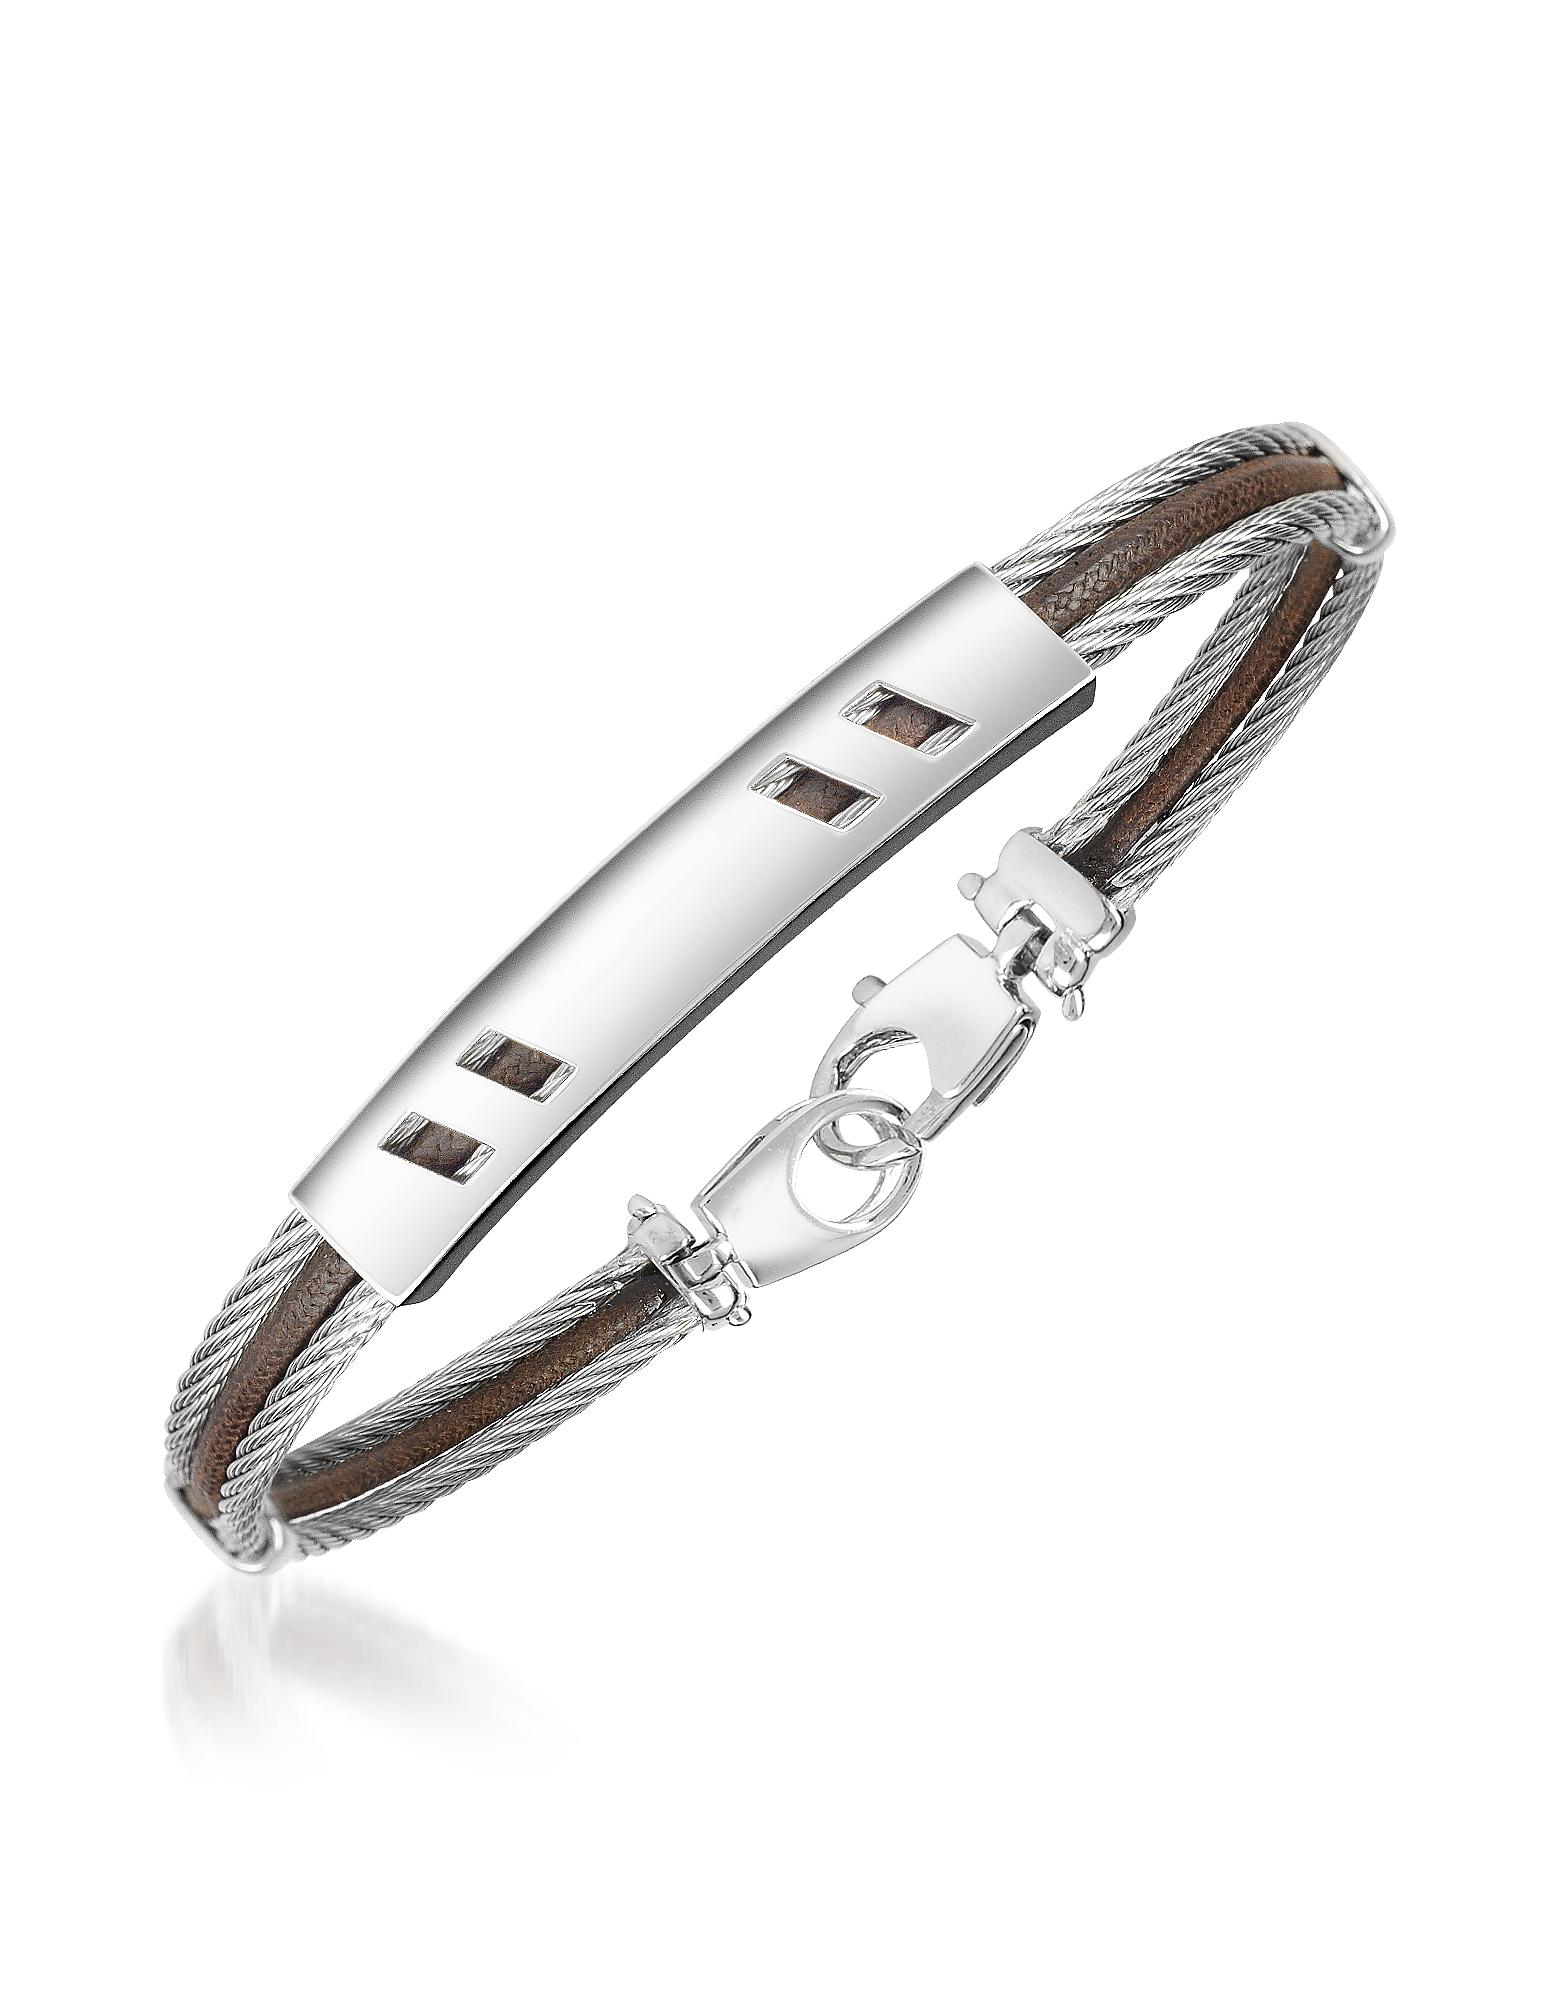 Forzieri Men's Bracelets, Di Fulco - Stainless Steel Bracelet w/ Plaque